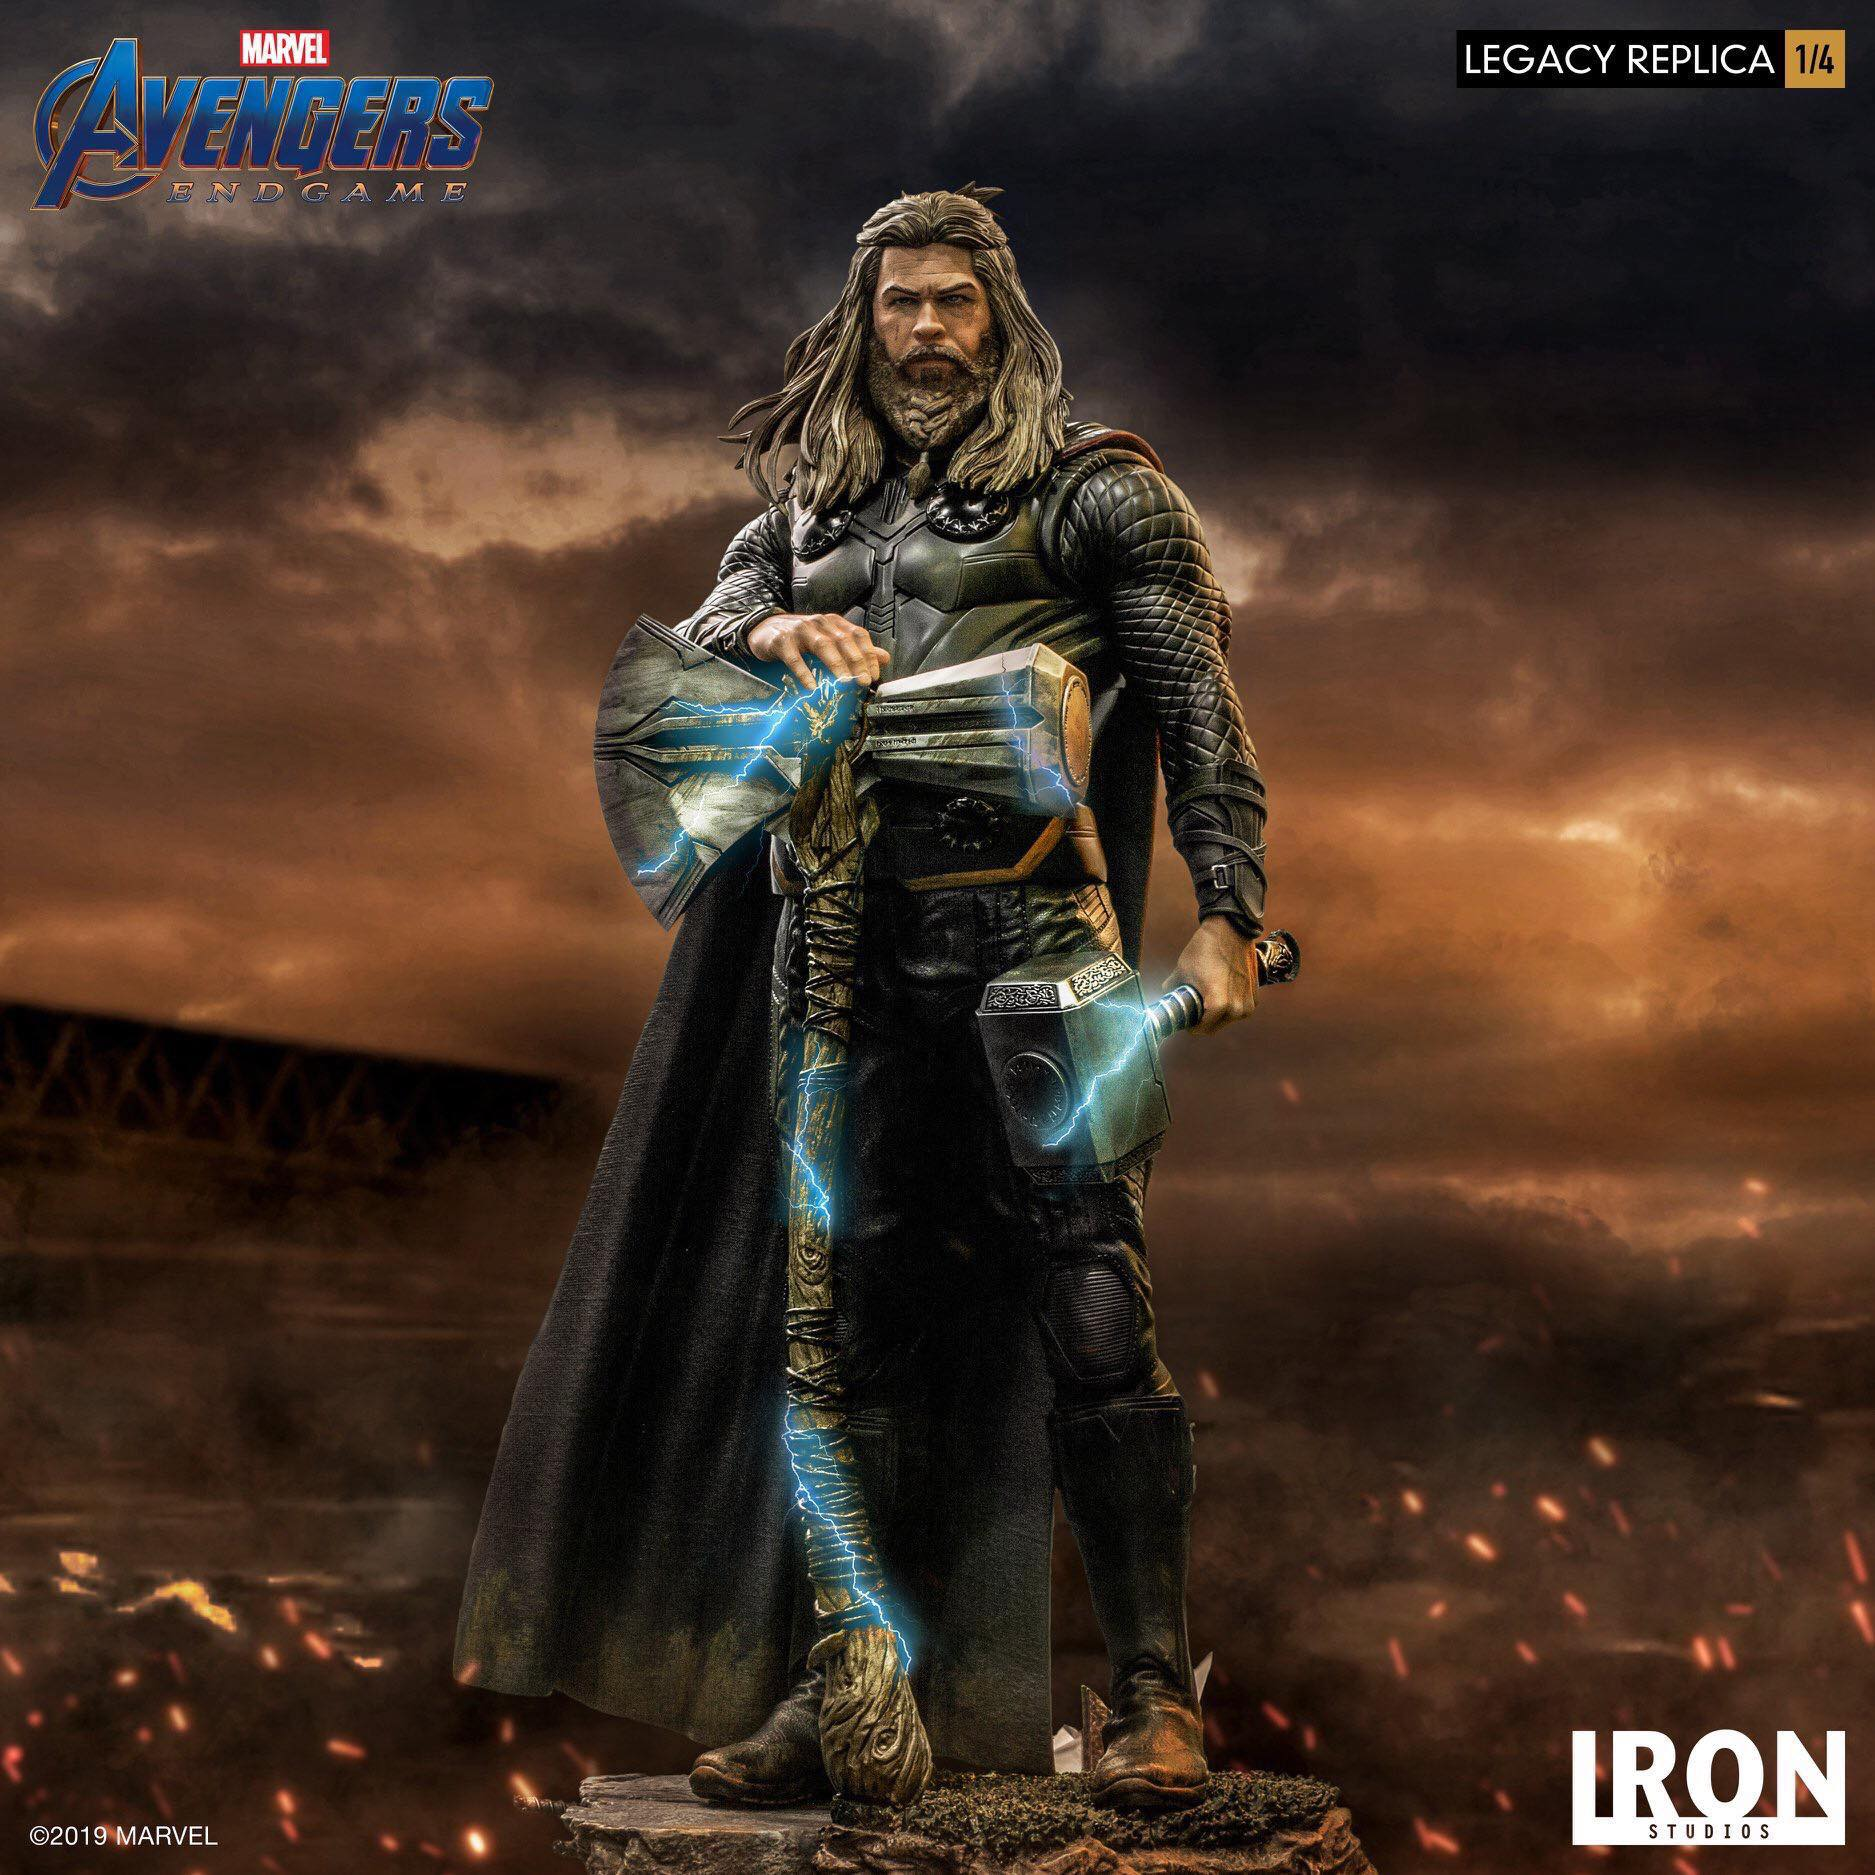 Thor Legacy Replica 1/4 Iron Studio